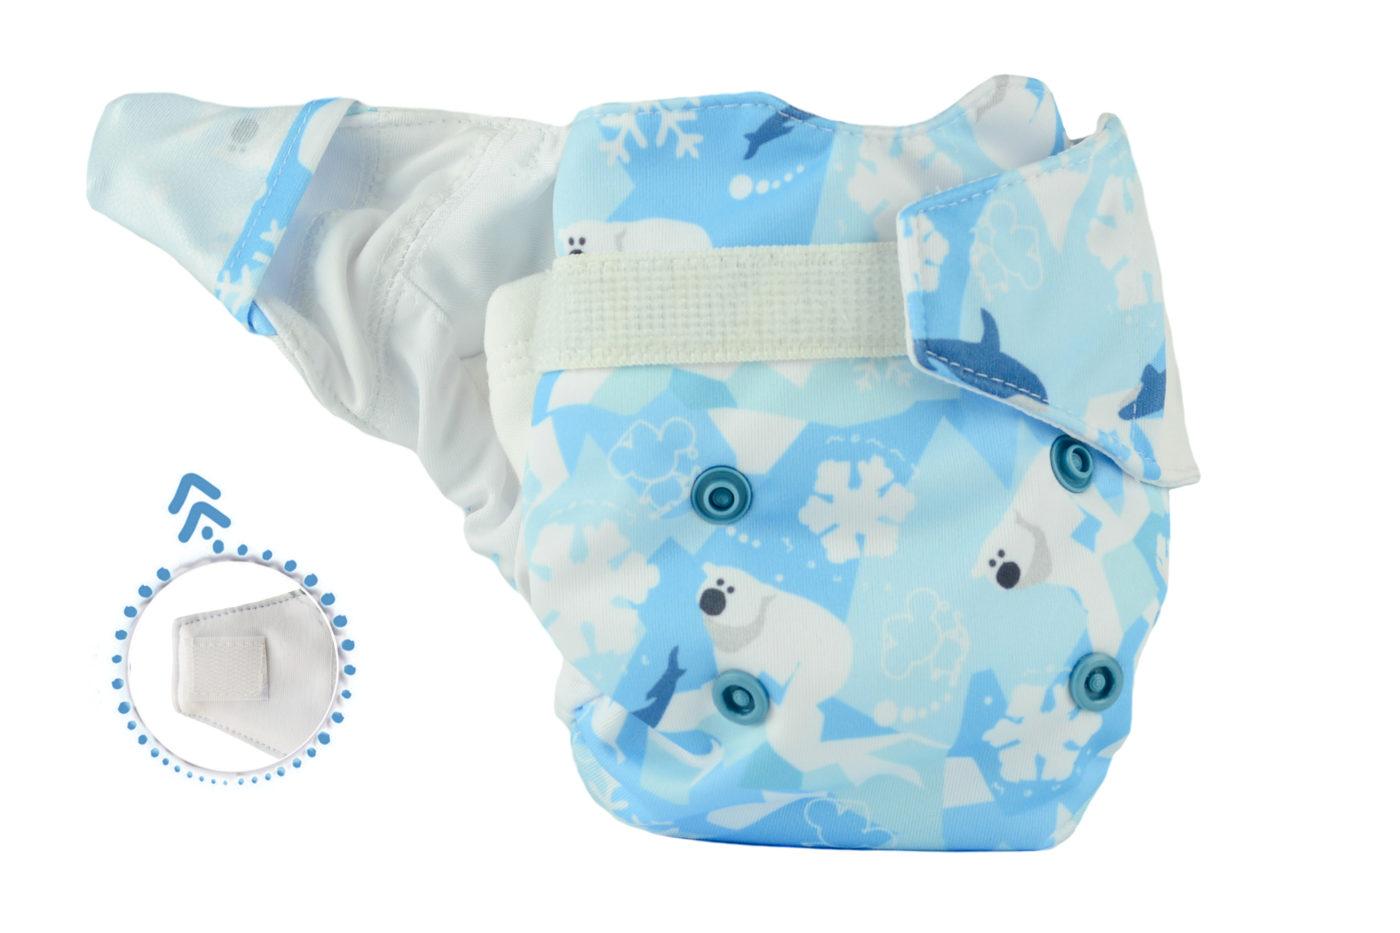 MM5 43 rzepy 1400x933 - Diaper AIO Newborn (ARCTOS)